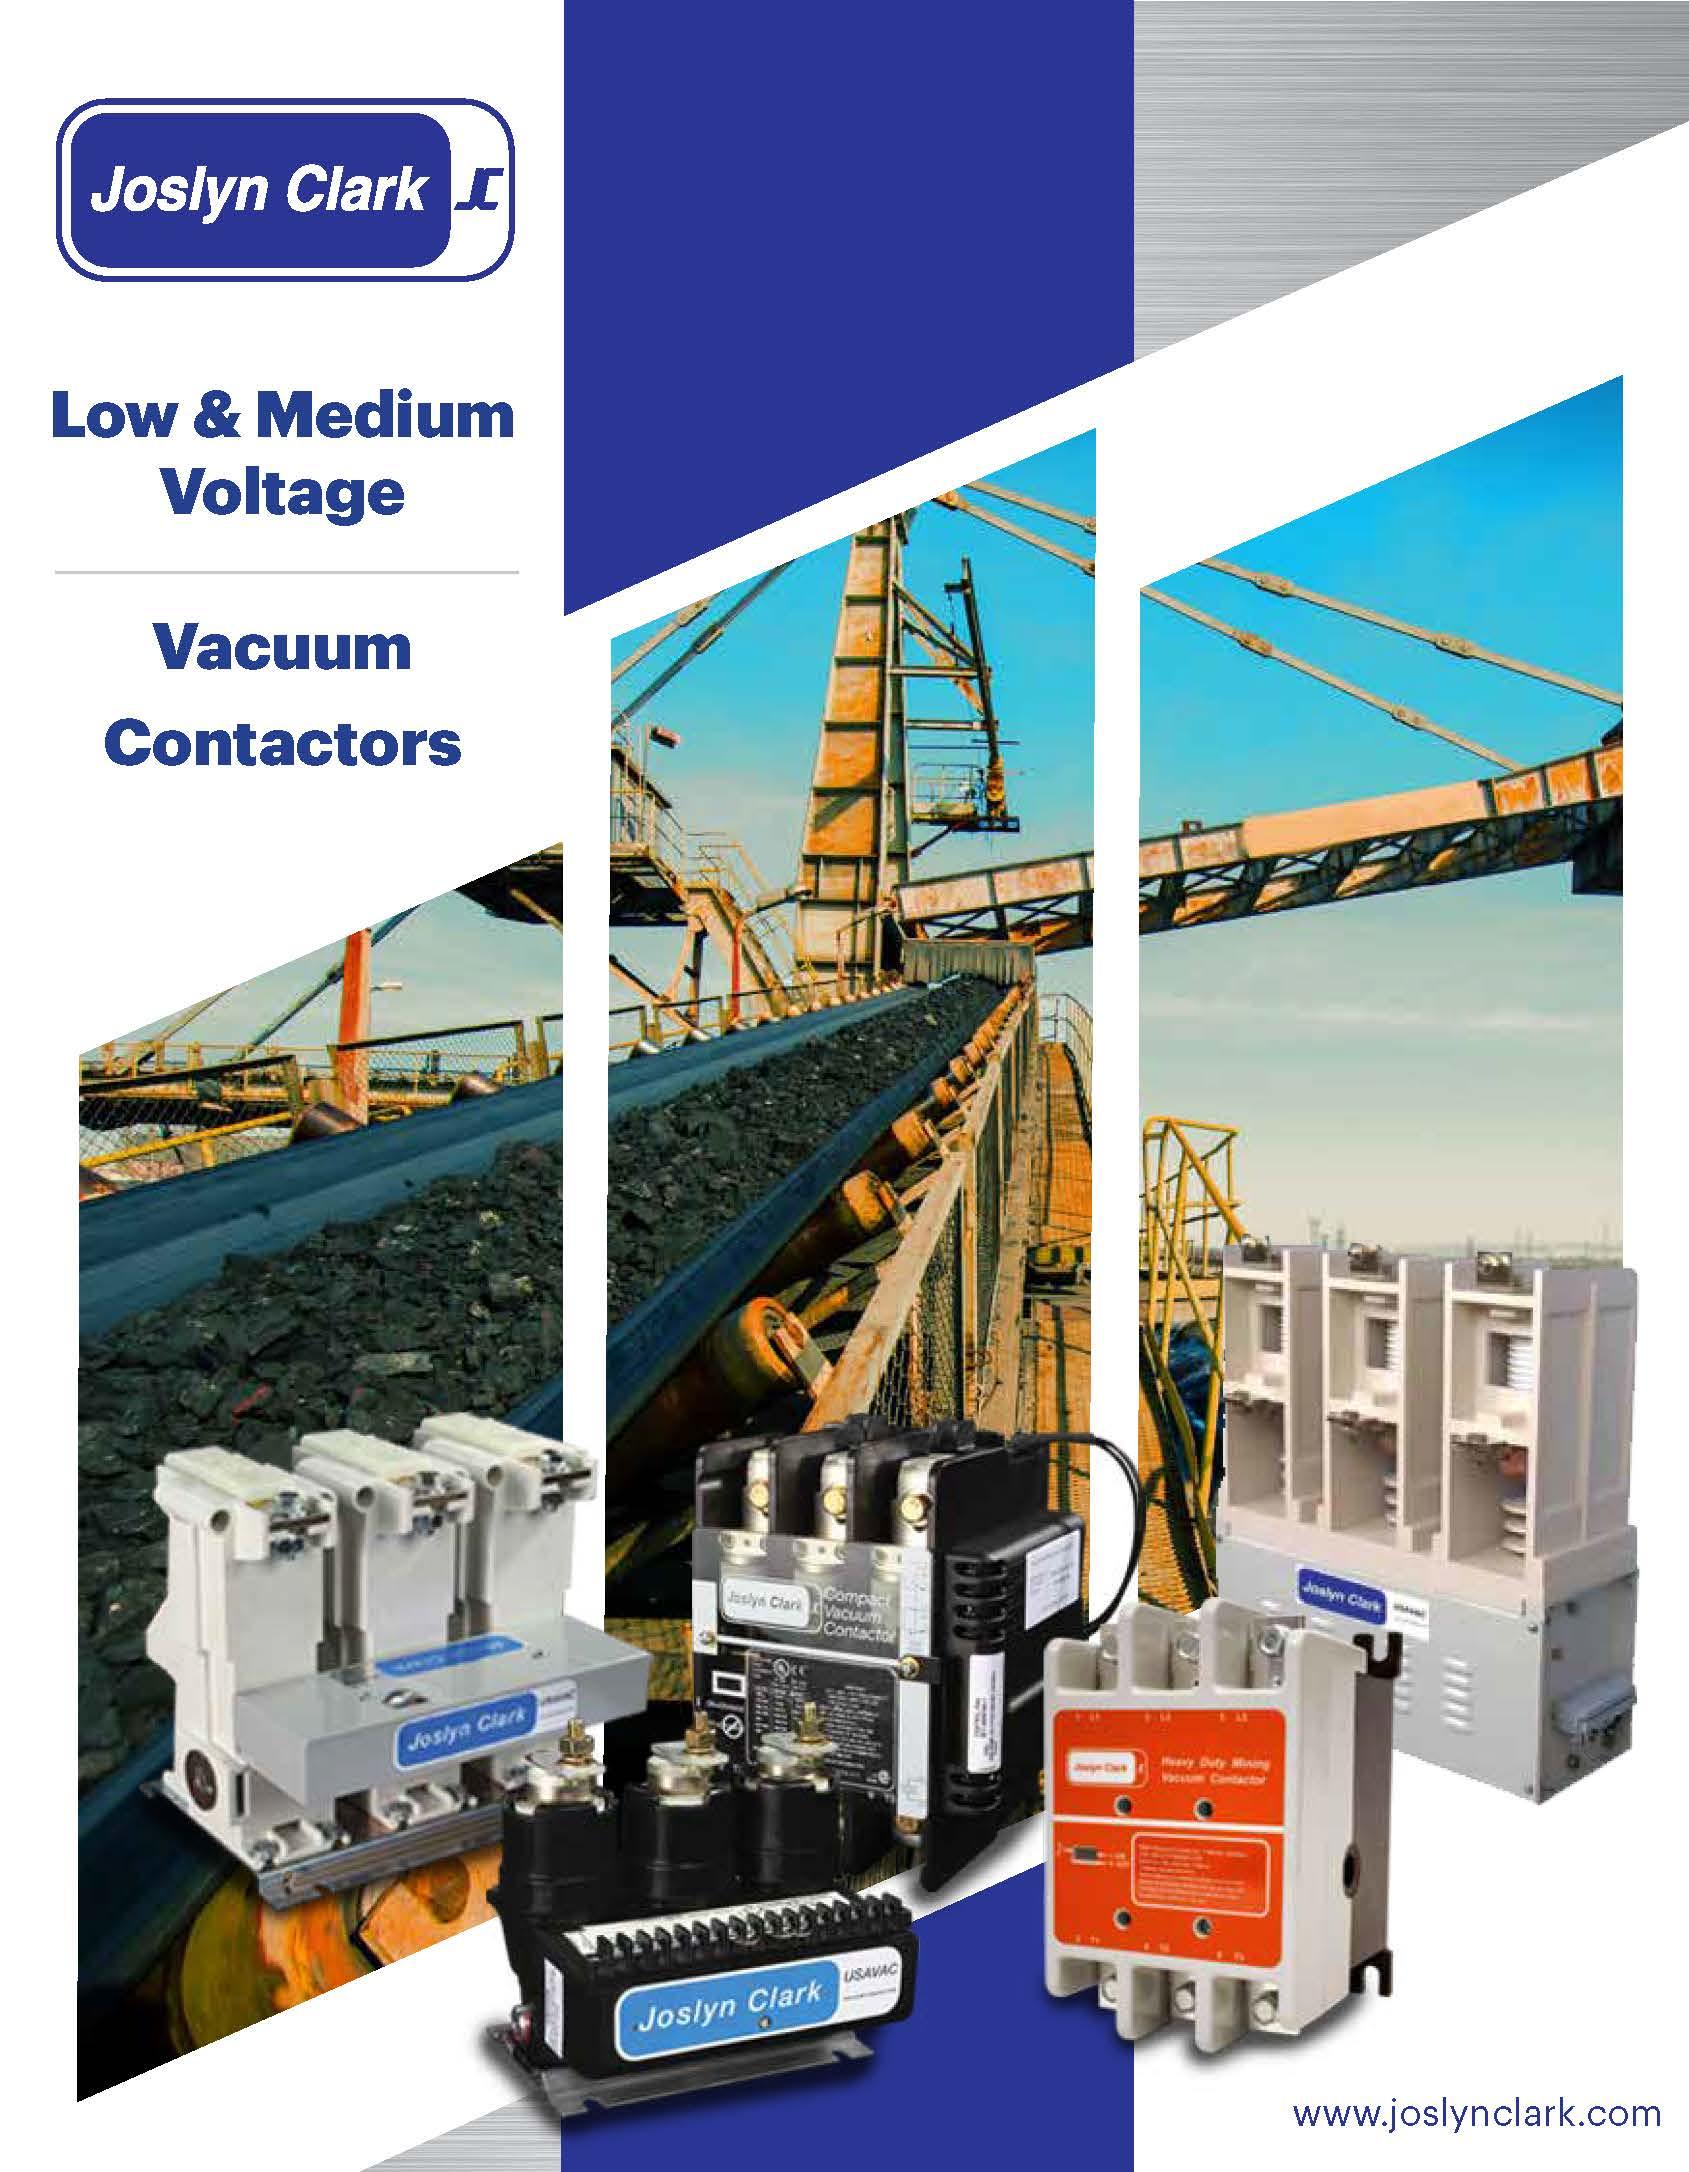 JCC1801 Rev. A - Vacuum Contactor Brochure_Page_01